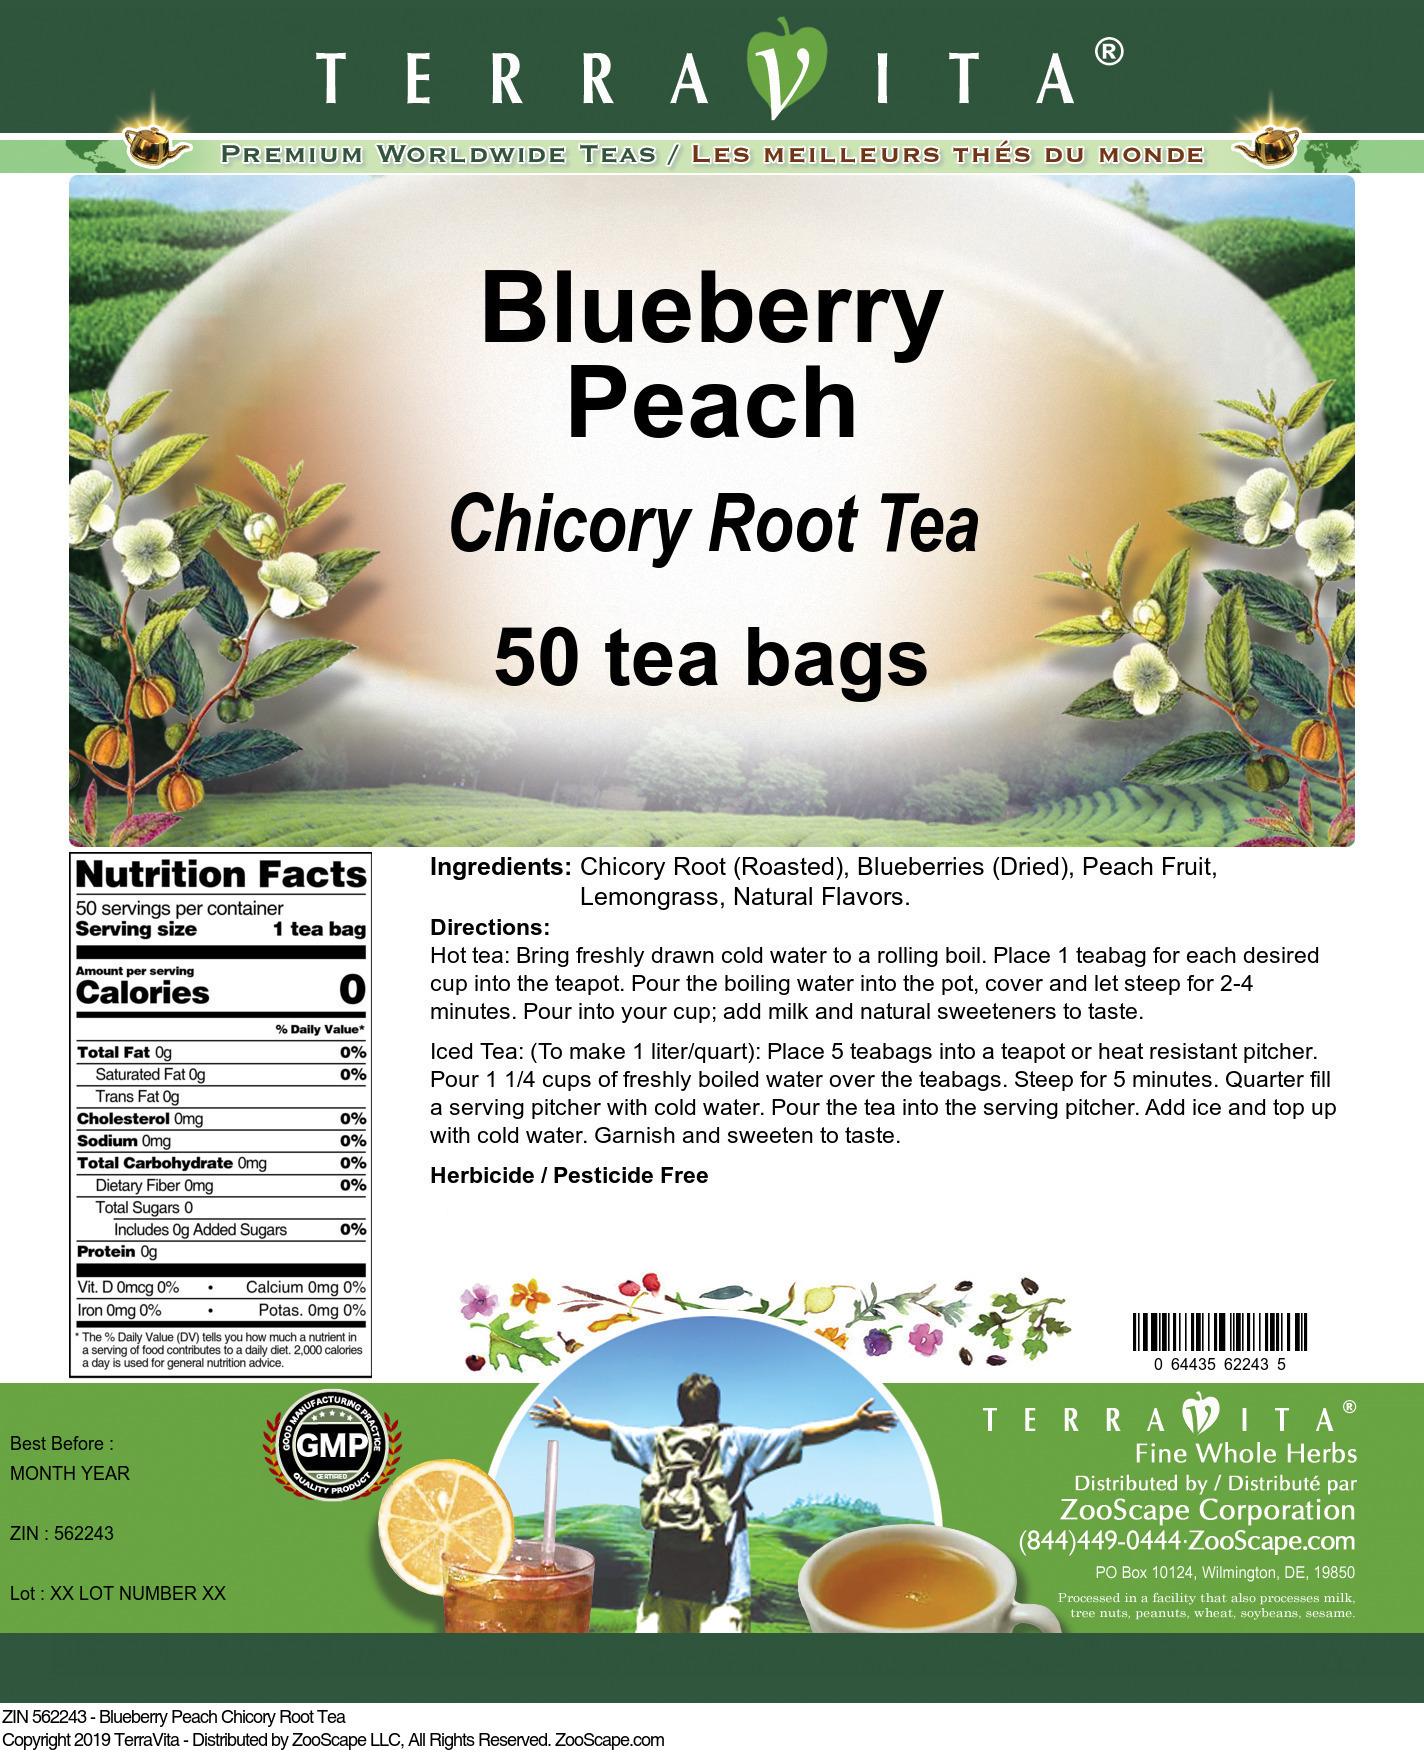 Blueberry Peach Chicory Root Tea